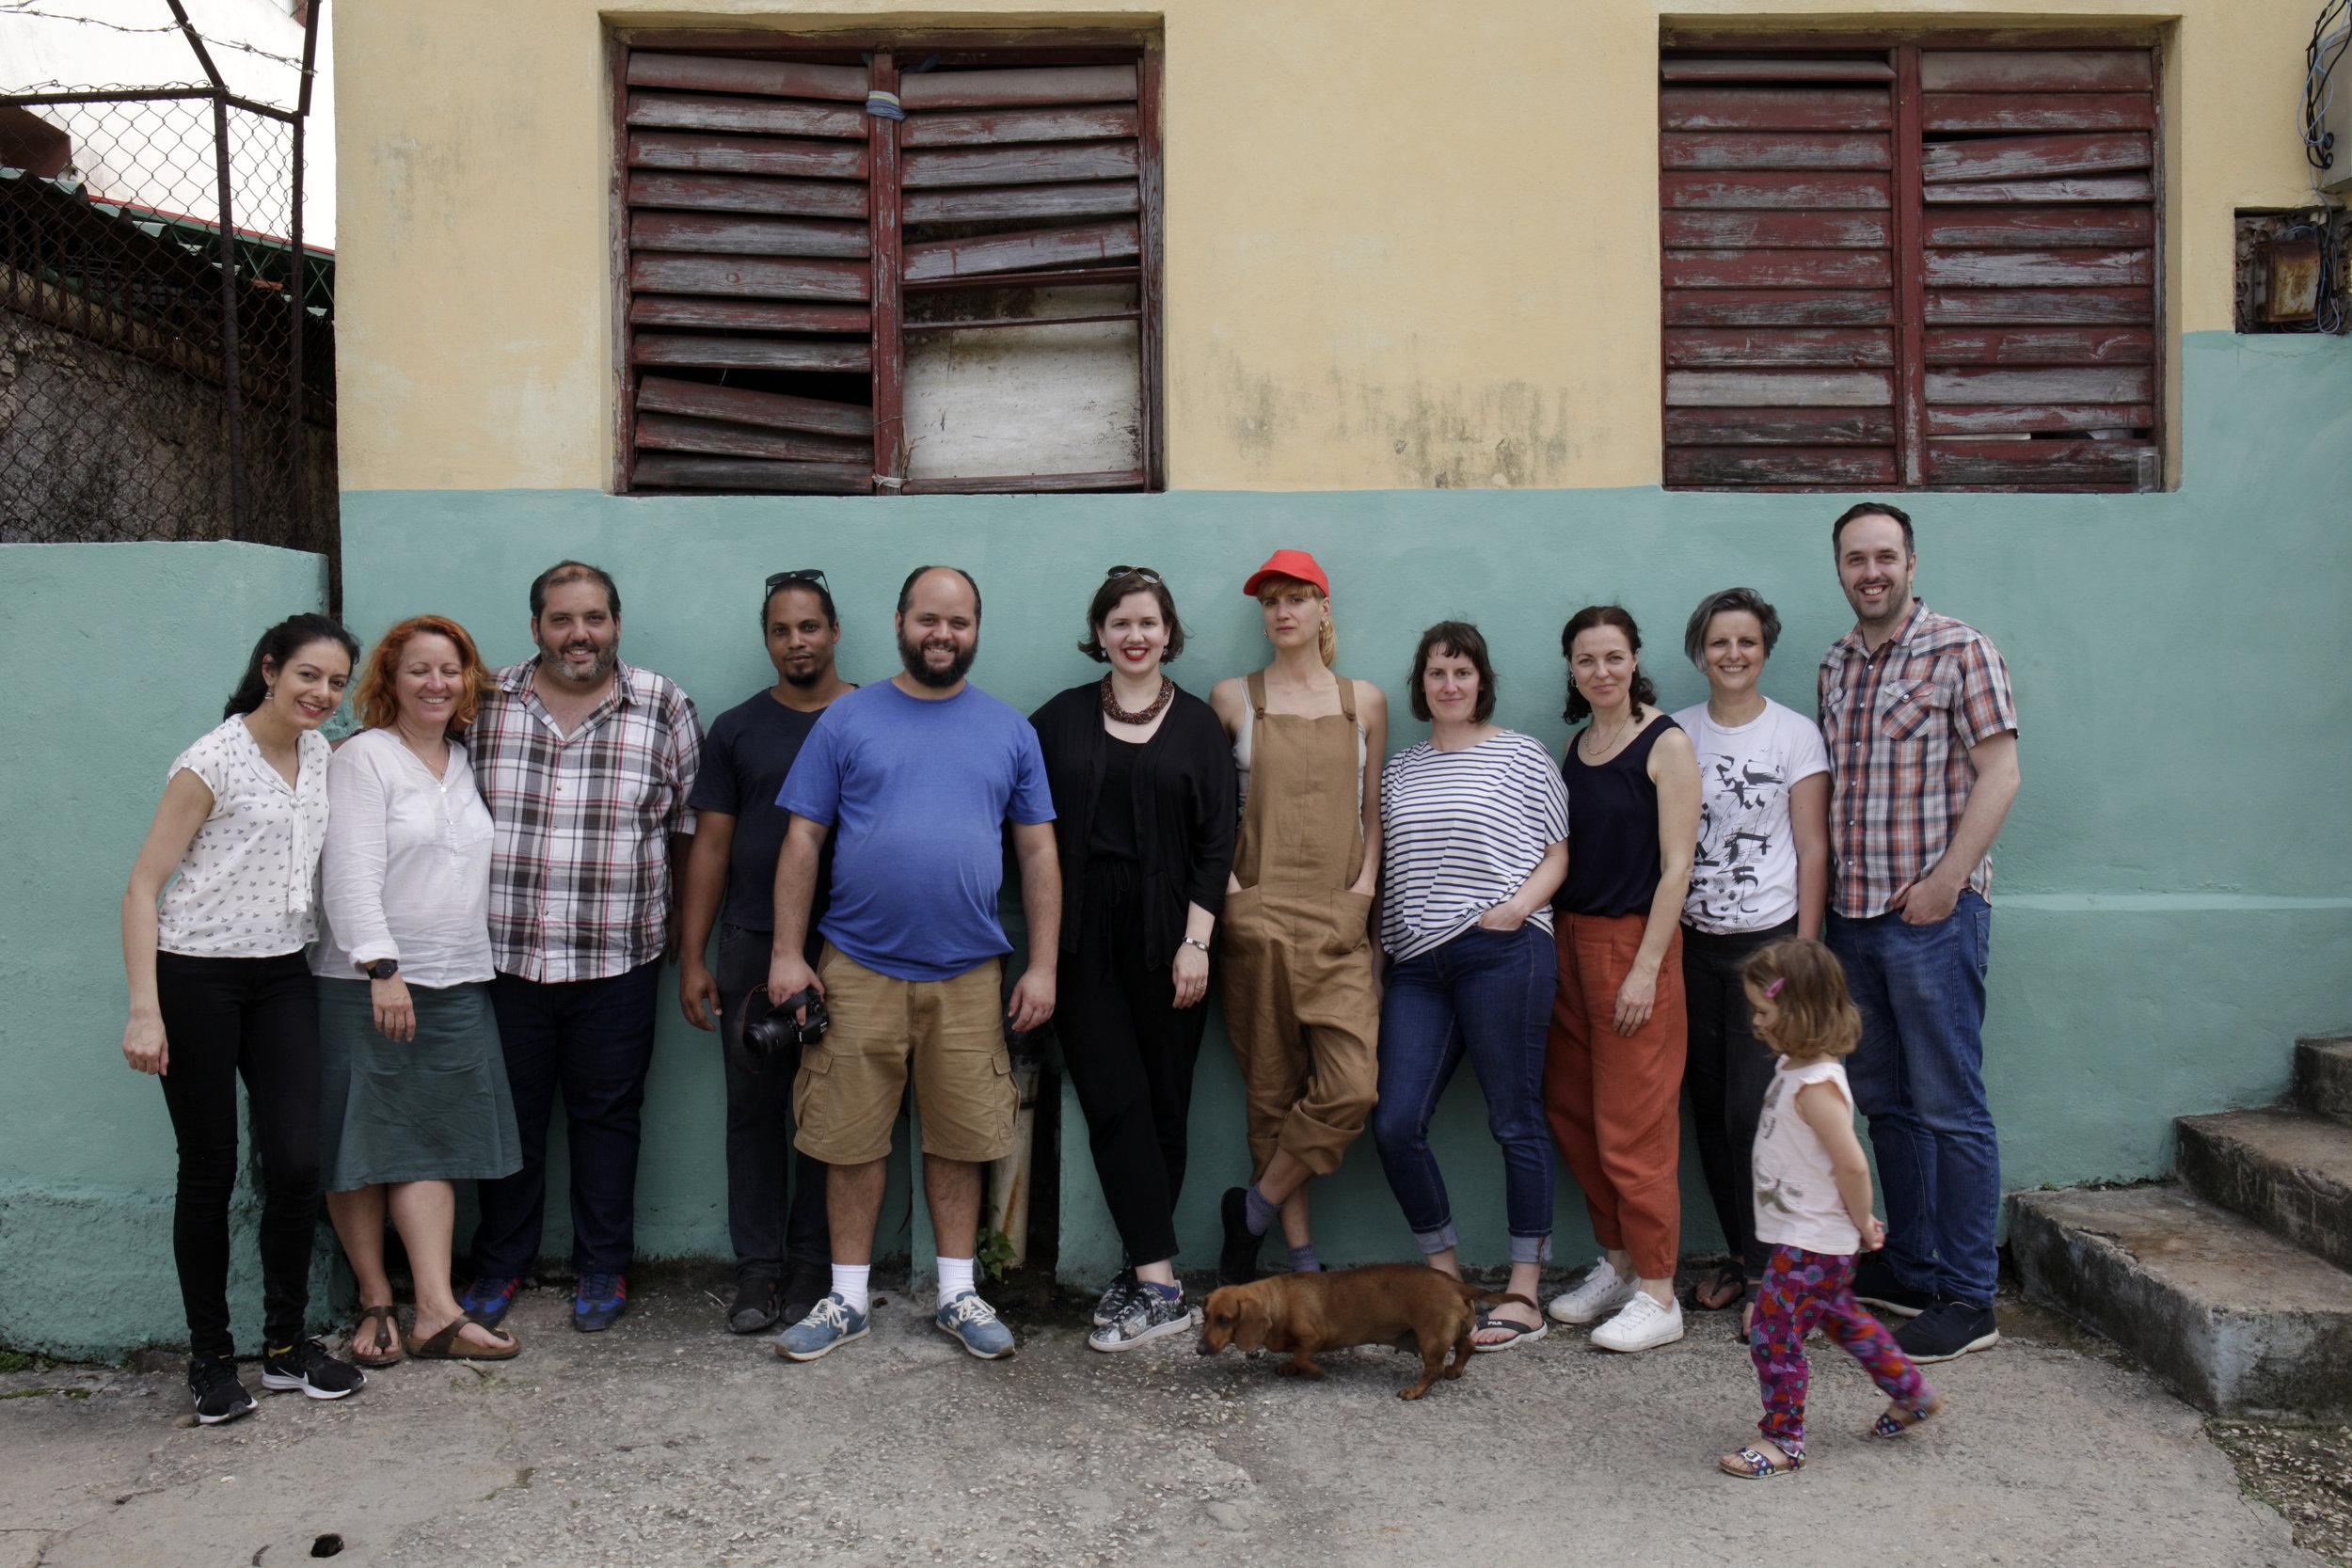 Picturing Climate network, Riera Studio, Havana, April 2019